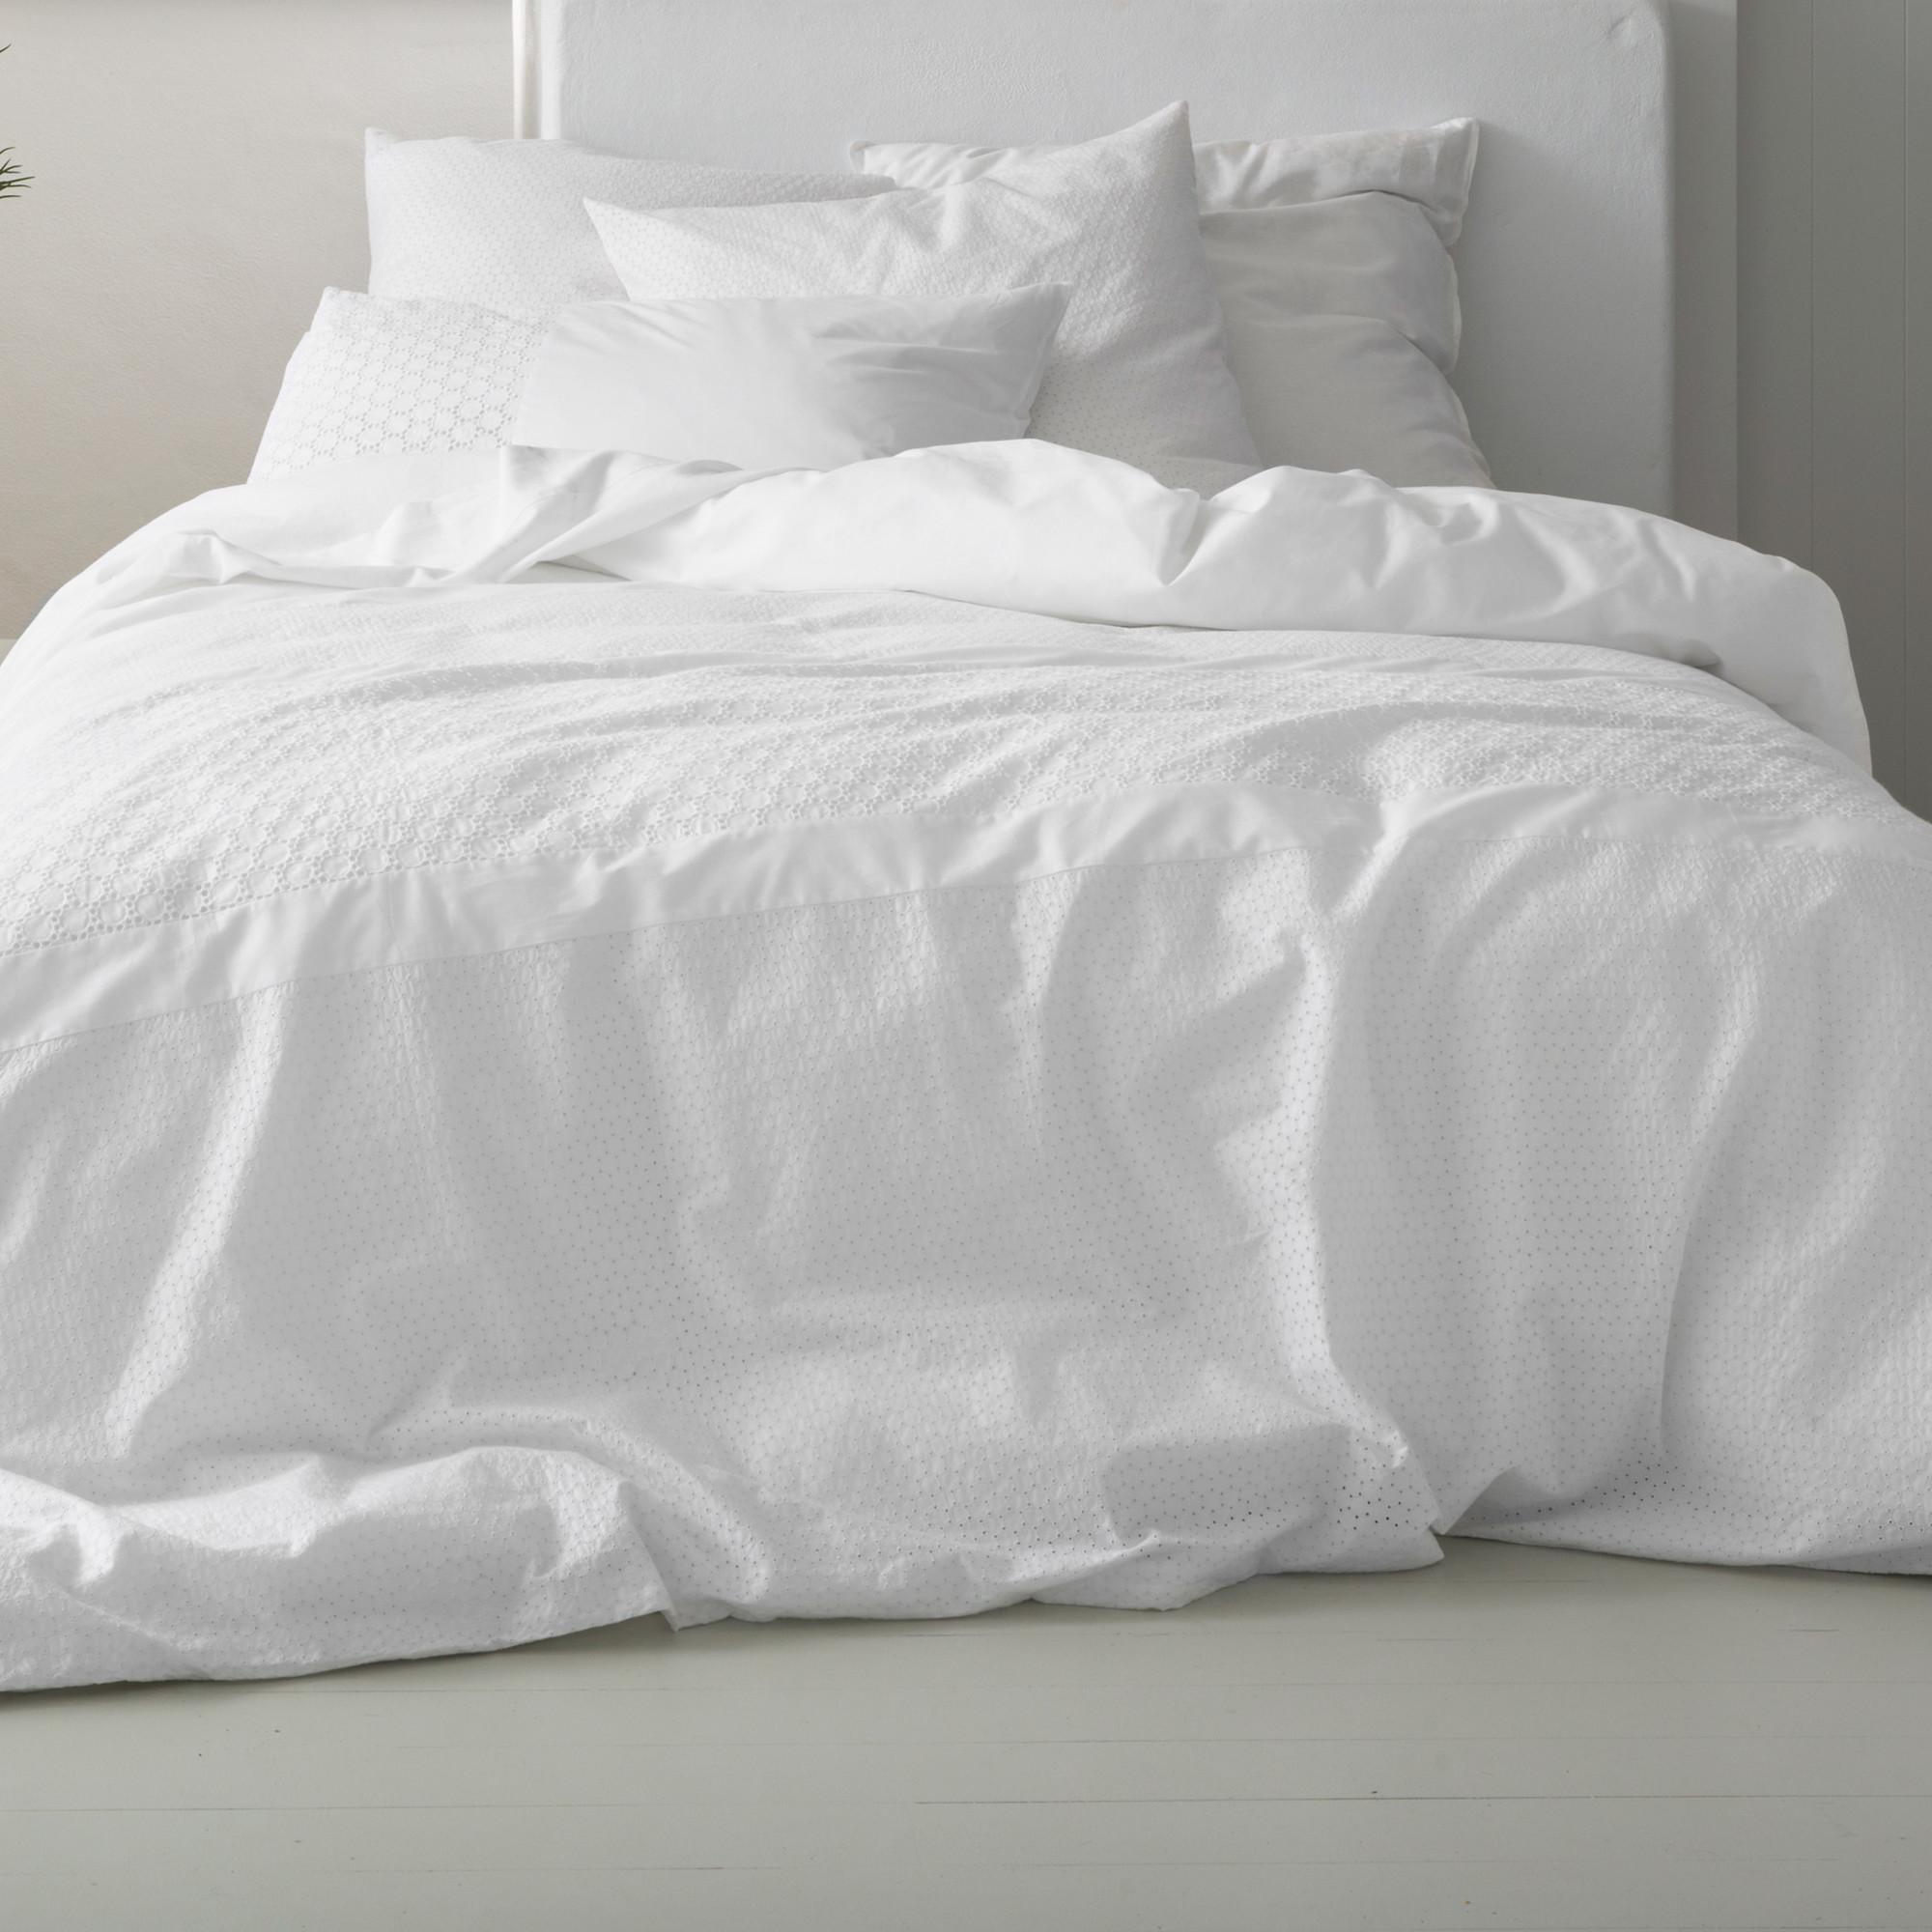 cover duvet white amarento